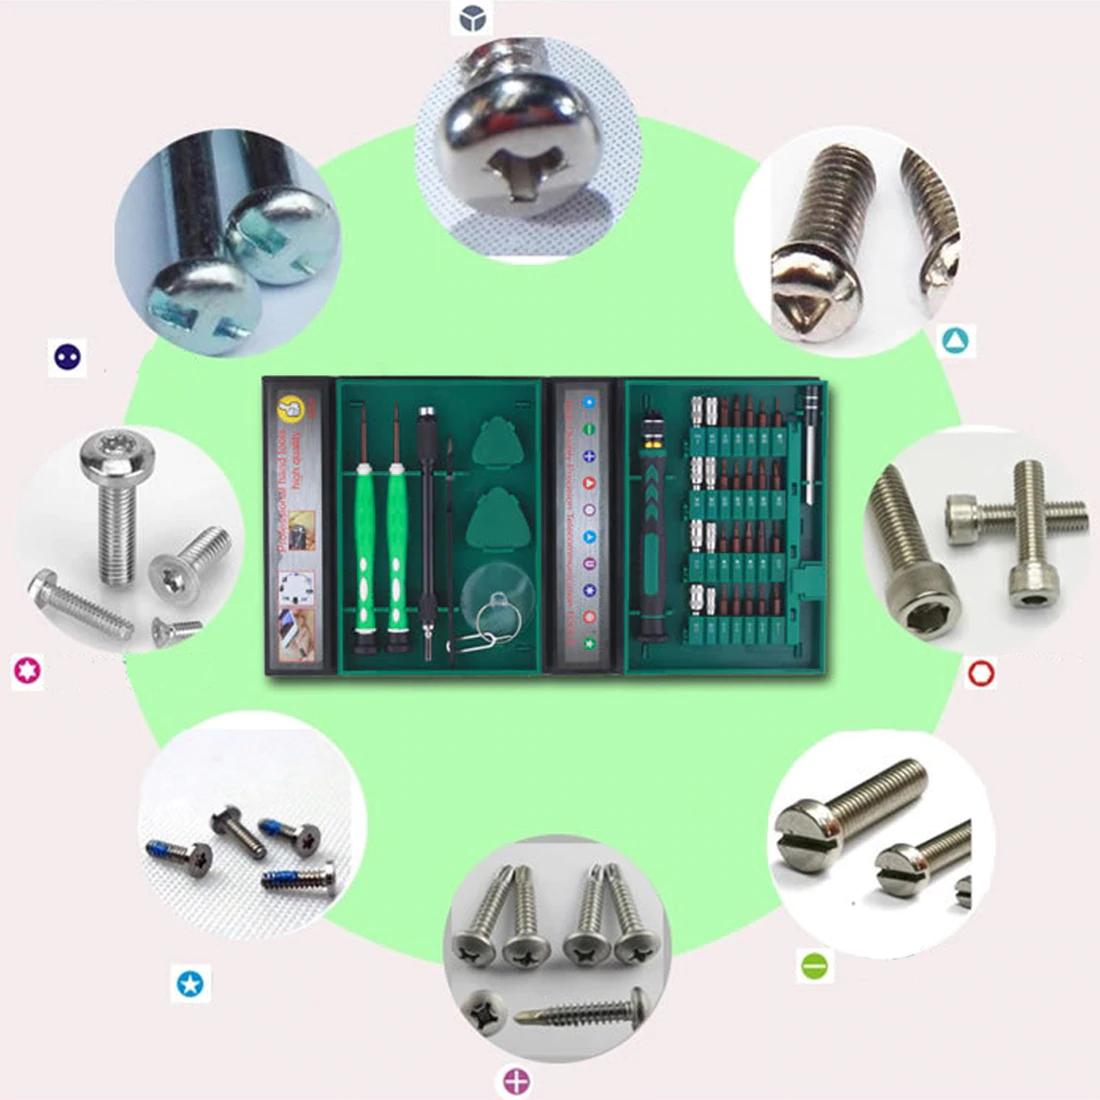 38-In-1-Magnetic-Screwdriver-Kit-4 38 In 1 Magnetic Screwdriver Kit